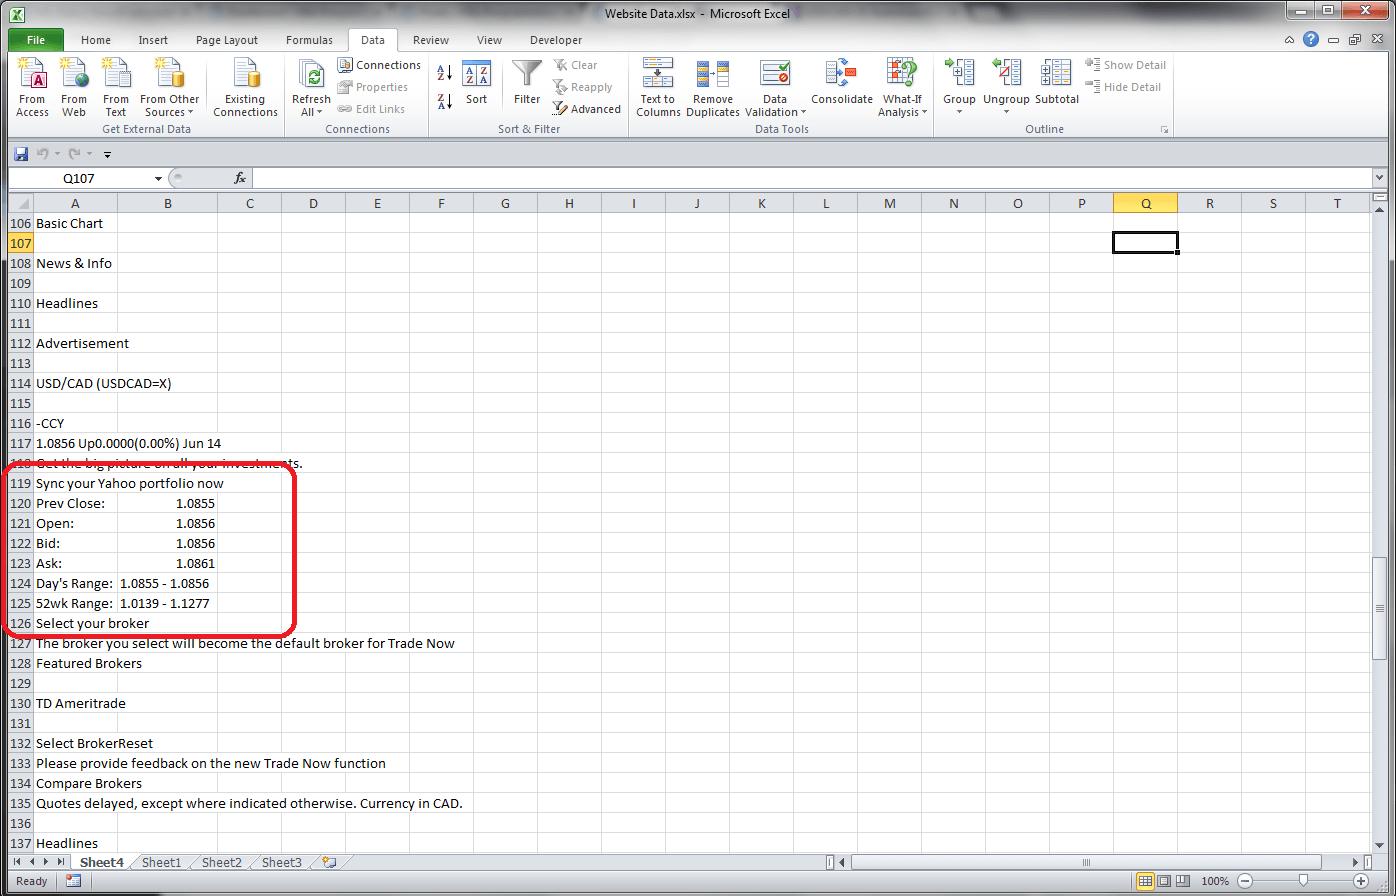 USD CAD, Data